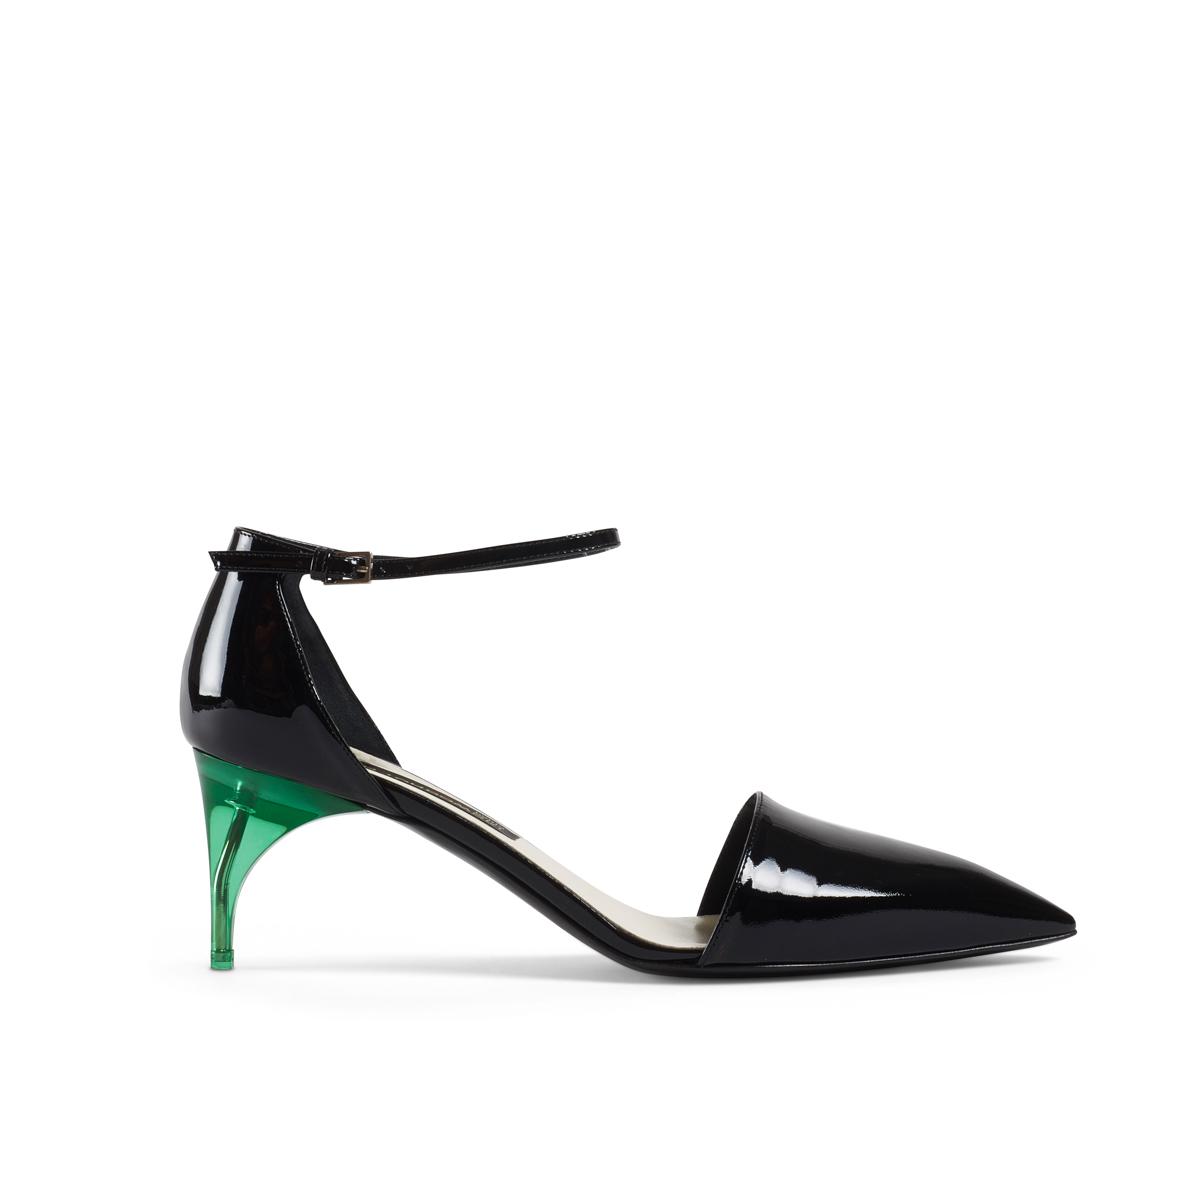 002_alaintondowski_springsummer2017_shoes_3041